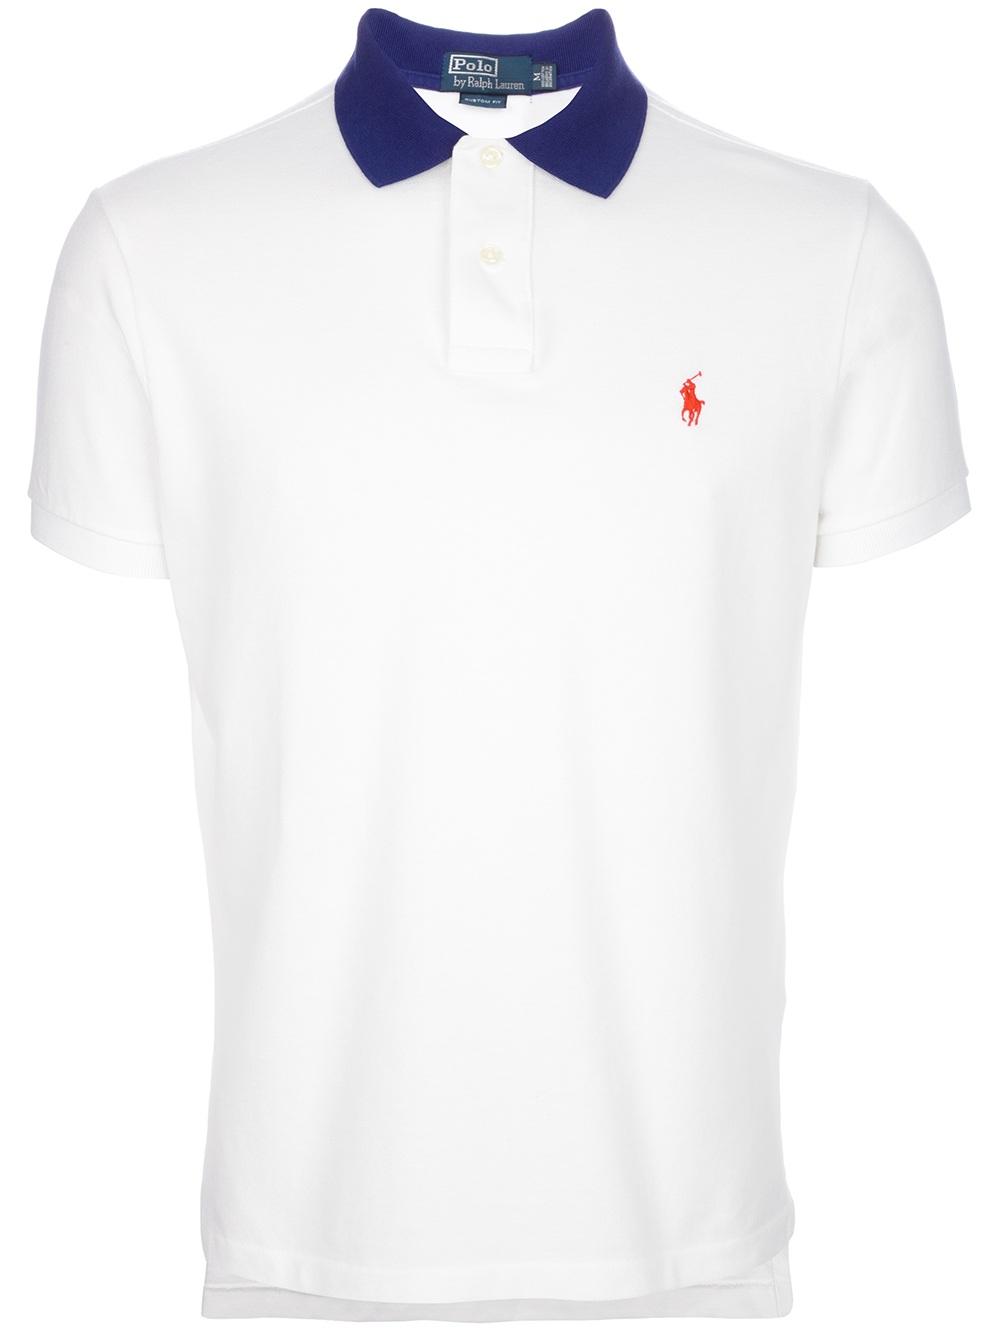 Lyst Polo Ralph Lauren Contrast Collar Polo Shirt In White For Men